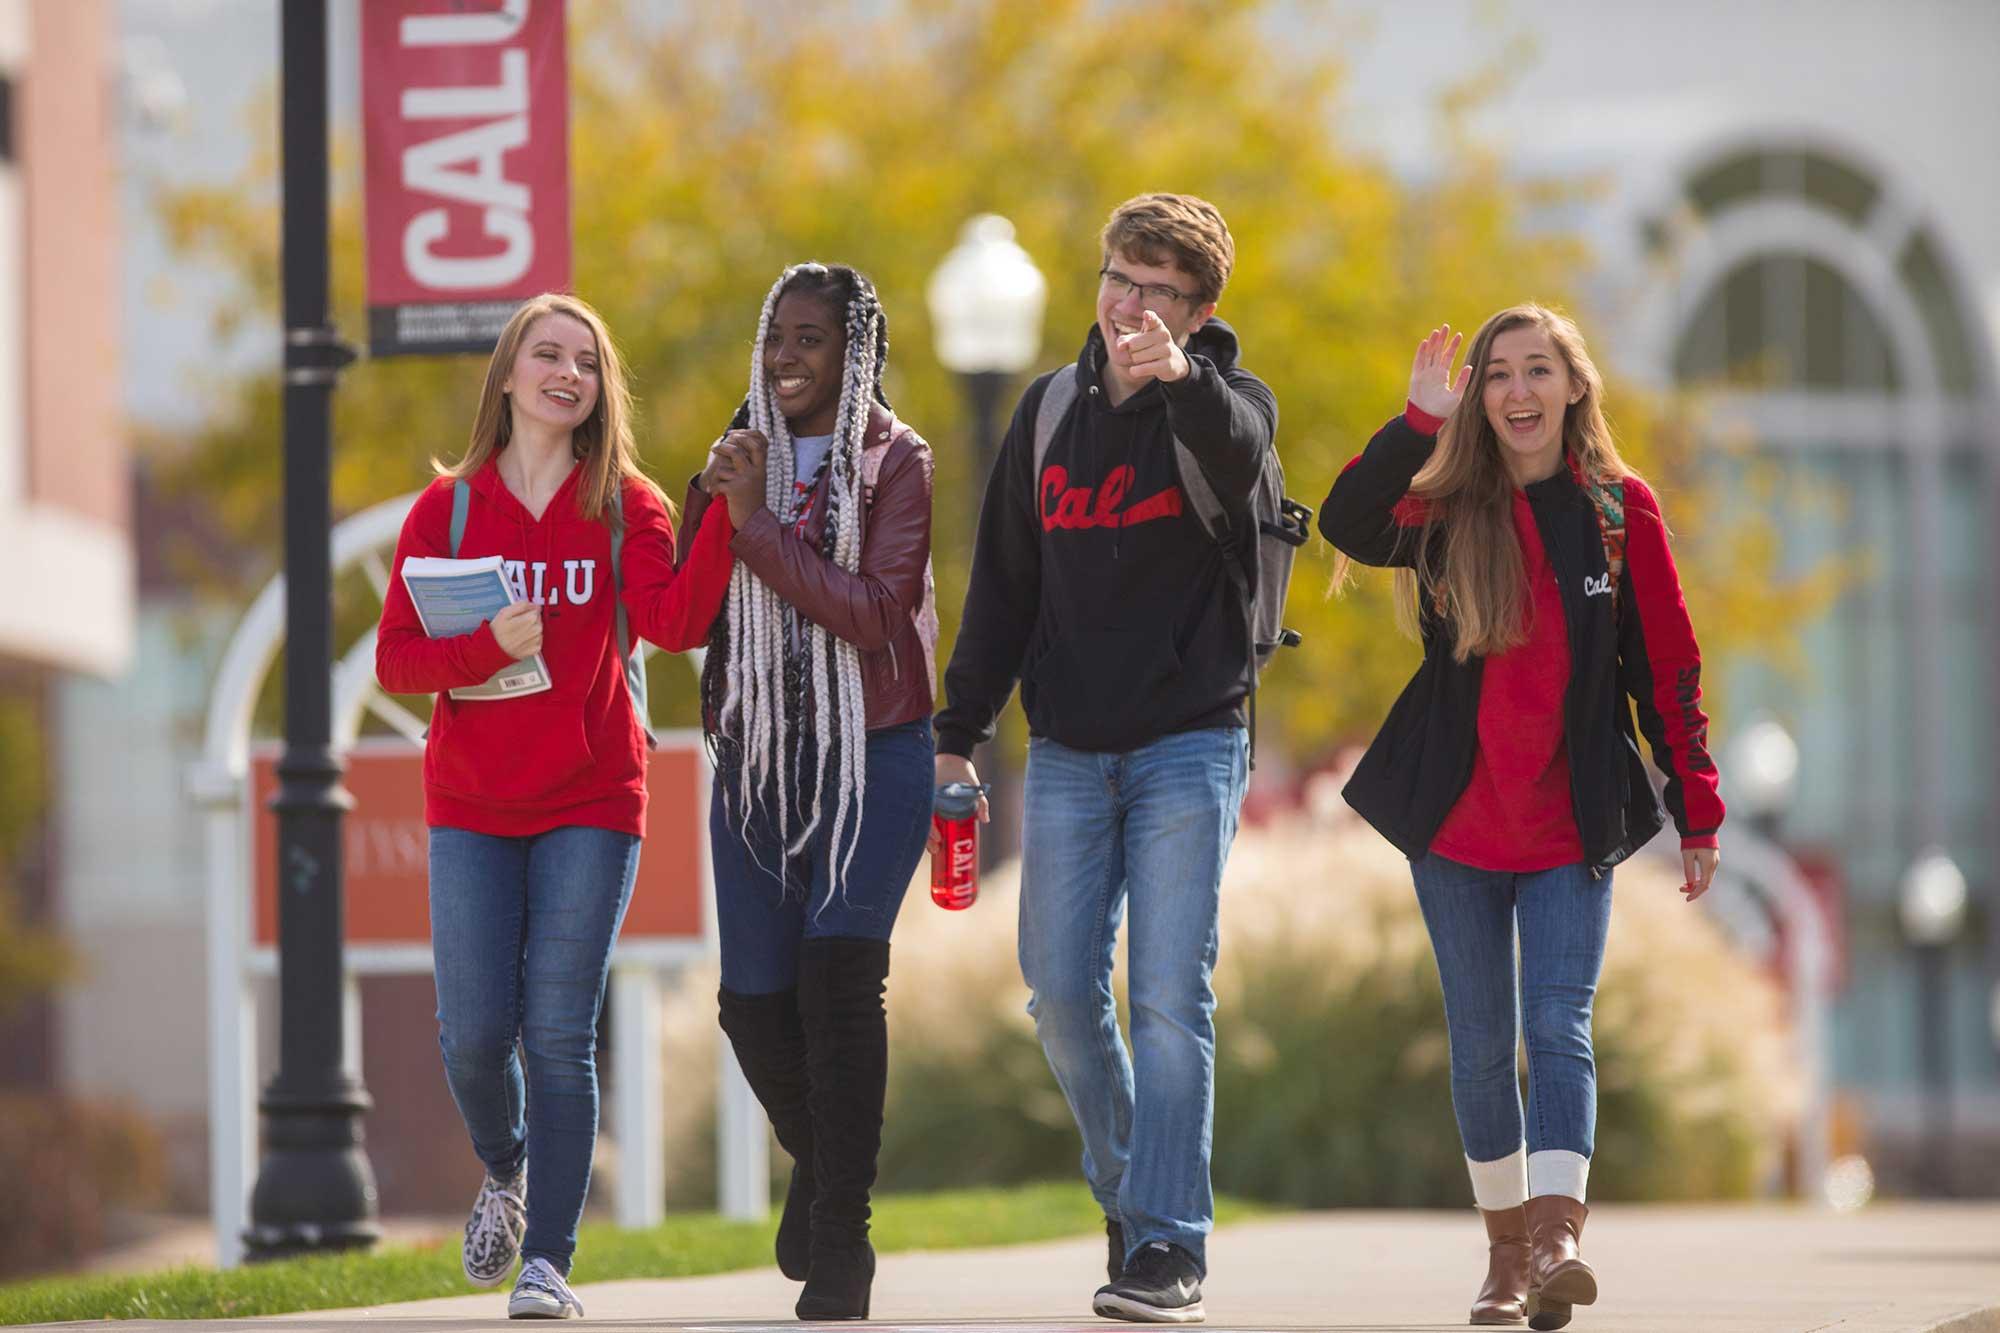 Cal U students walking to class.